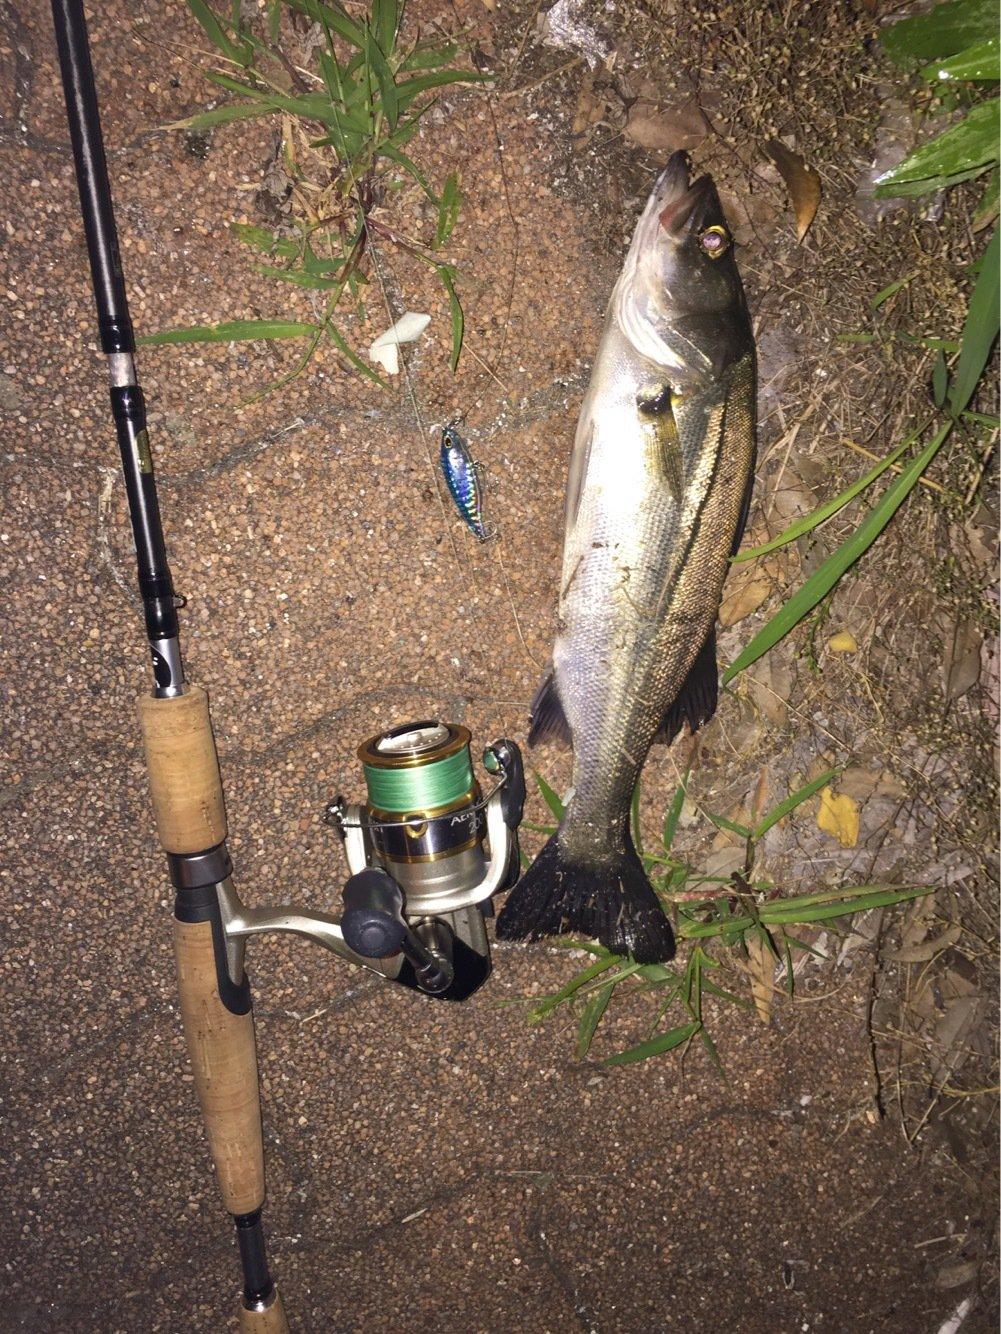 thegskさんの投稿画像,写っている魚はスズキ